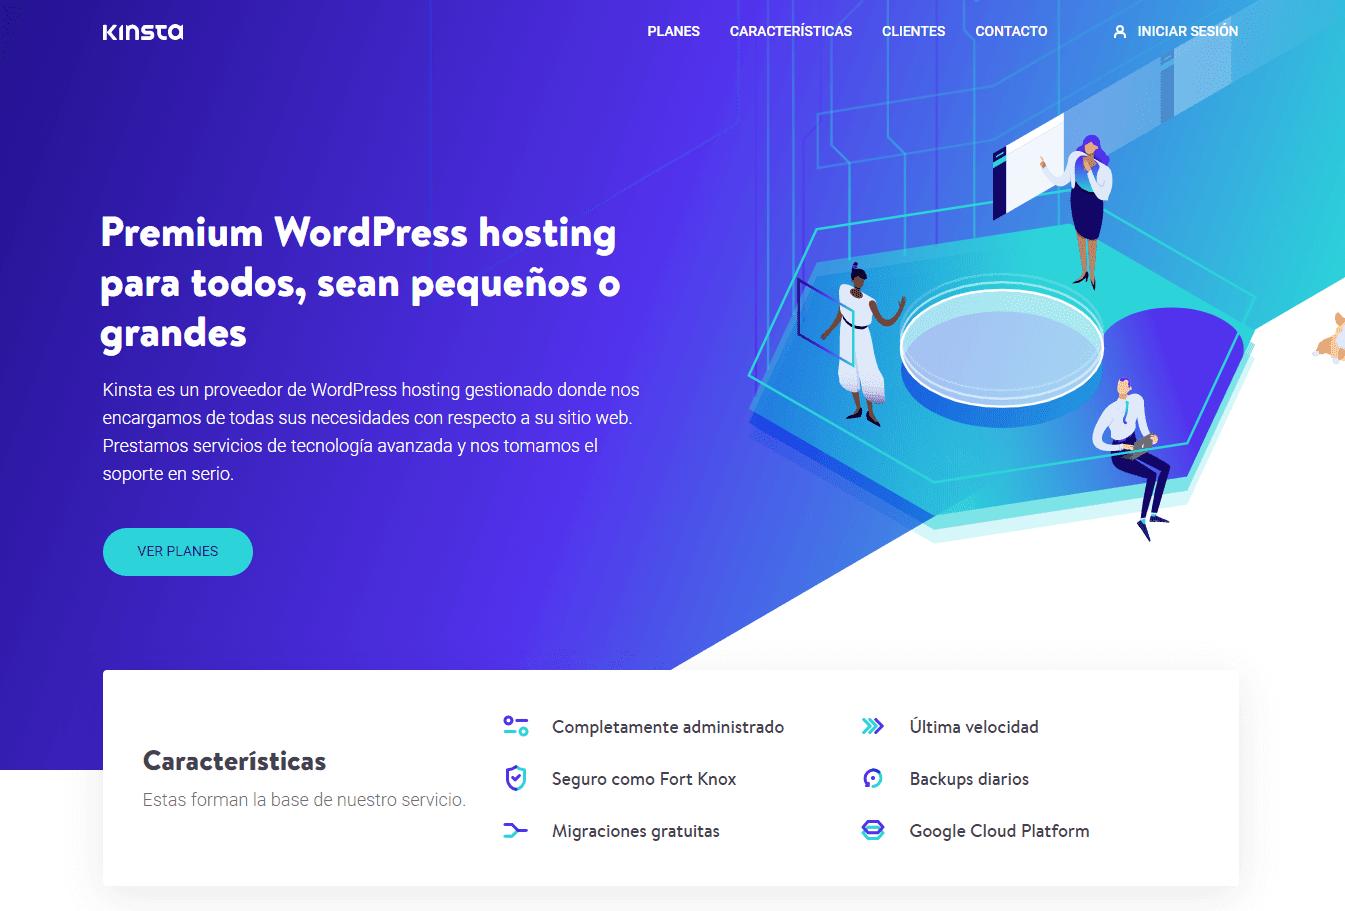 kinsta website spanish